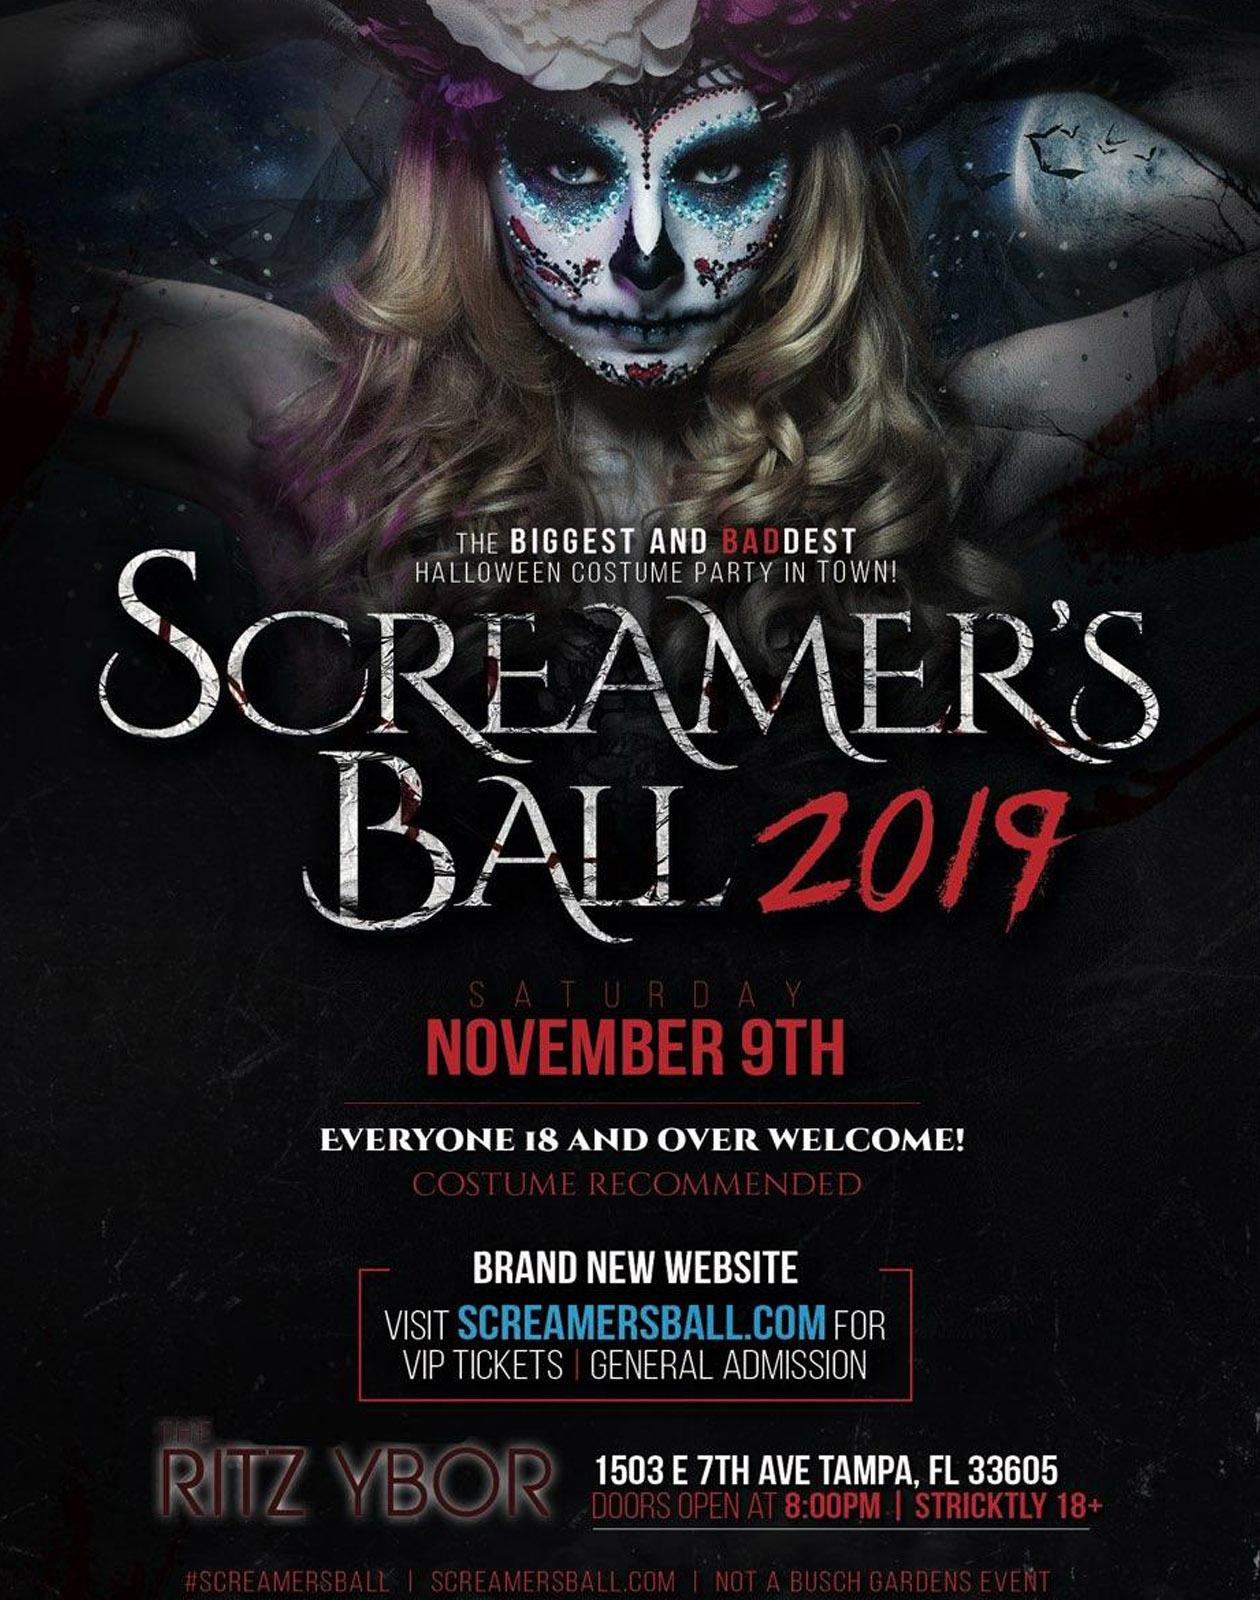 Screamer's Ball 2019 at The RITZ Ybor – 11/9/2019